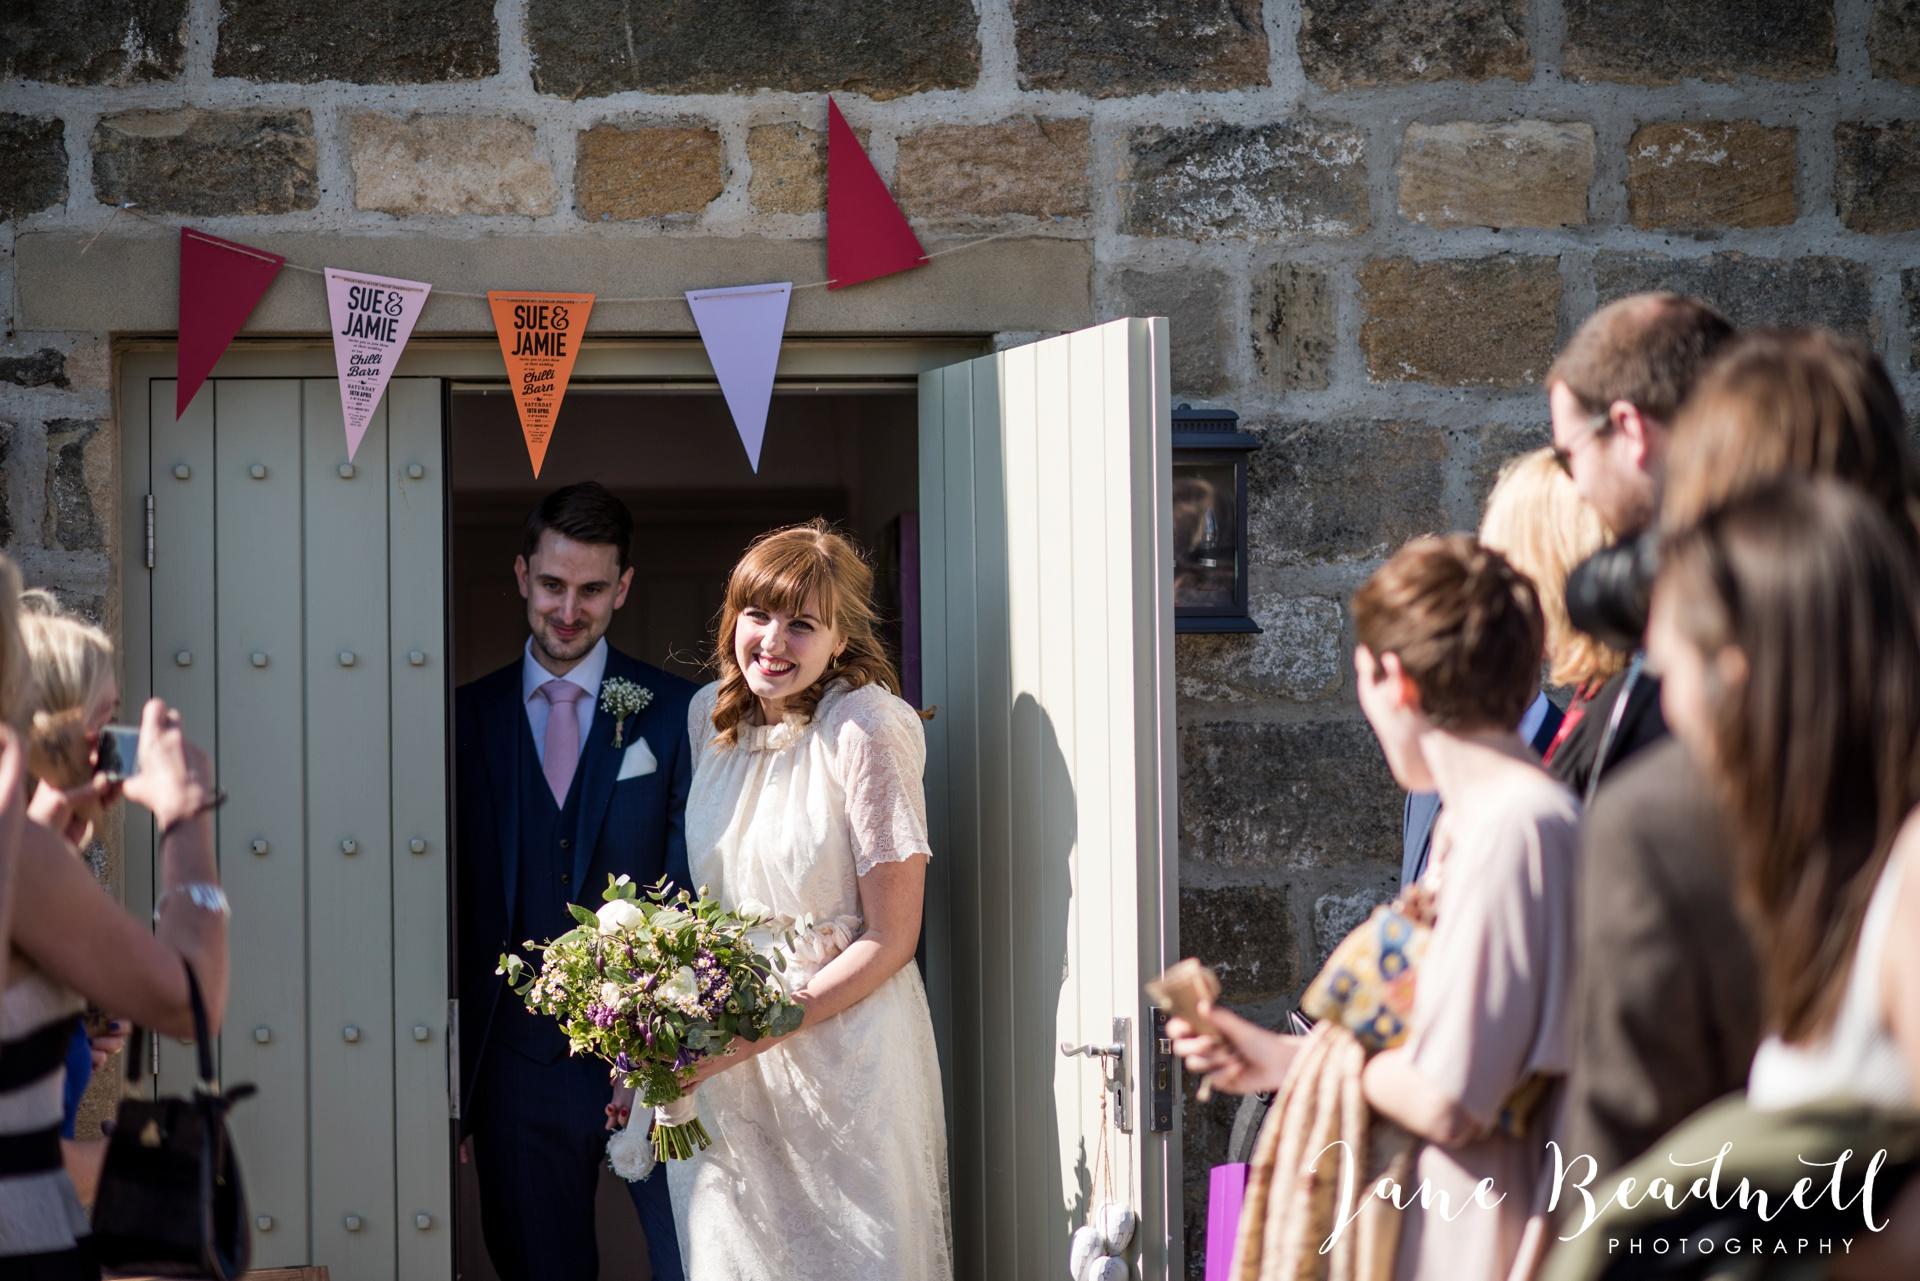 Jane Beadnell fine art wedding photographer The Cheerful Chilli Barn Otley_0024